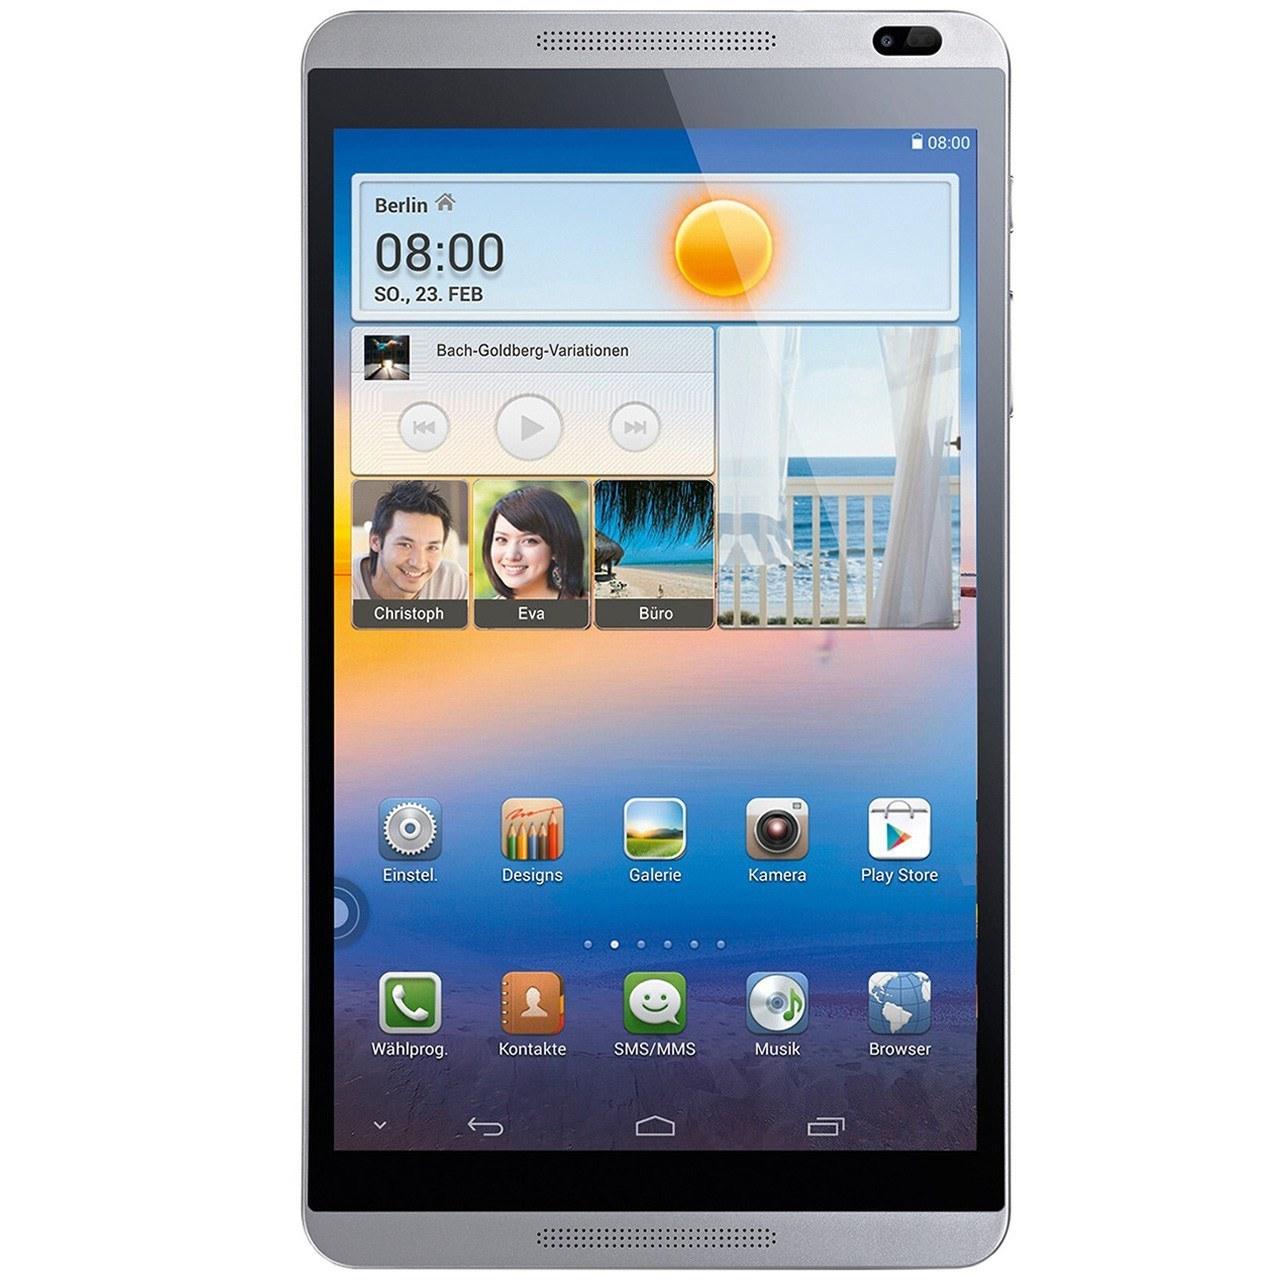 تبلت هوآوي مدل MediaPad M1 8.0 3G - ظرفيت 8 گيگابايت | Huawei MediaPad M1 3G Tablet - 8GB